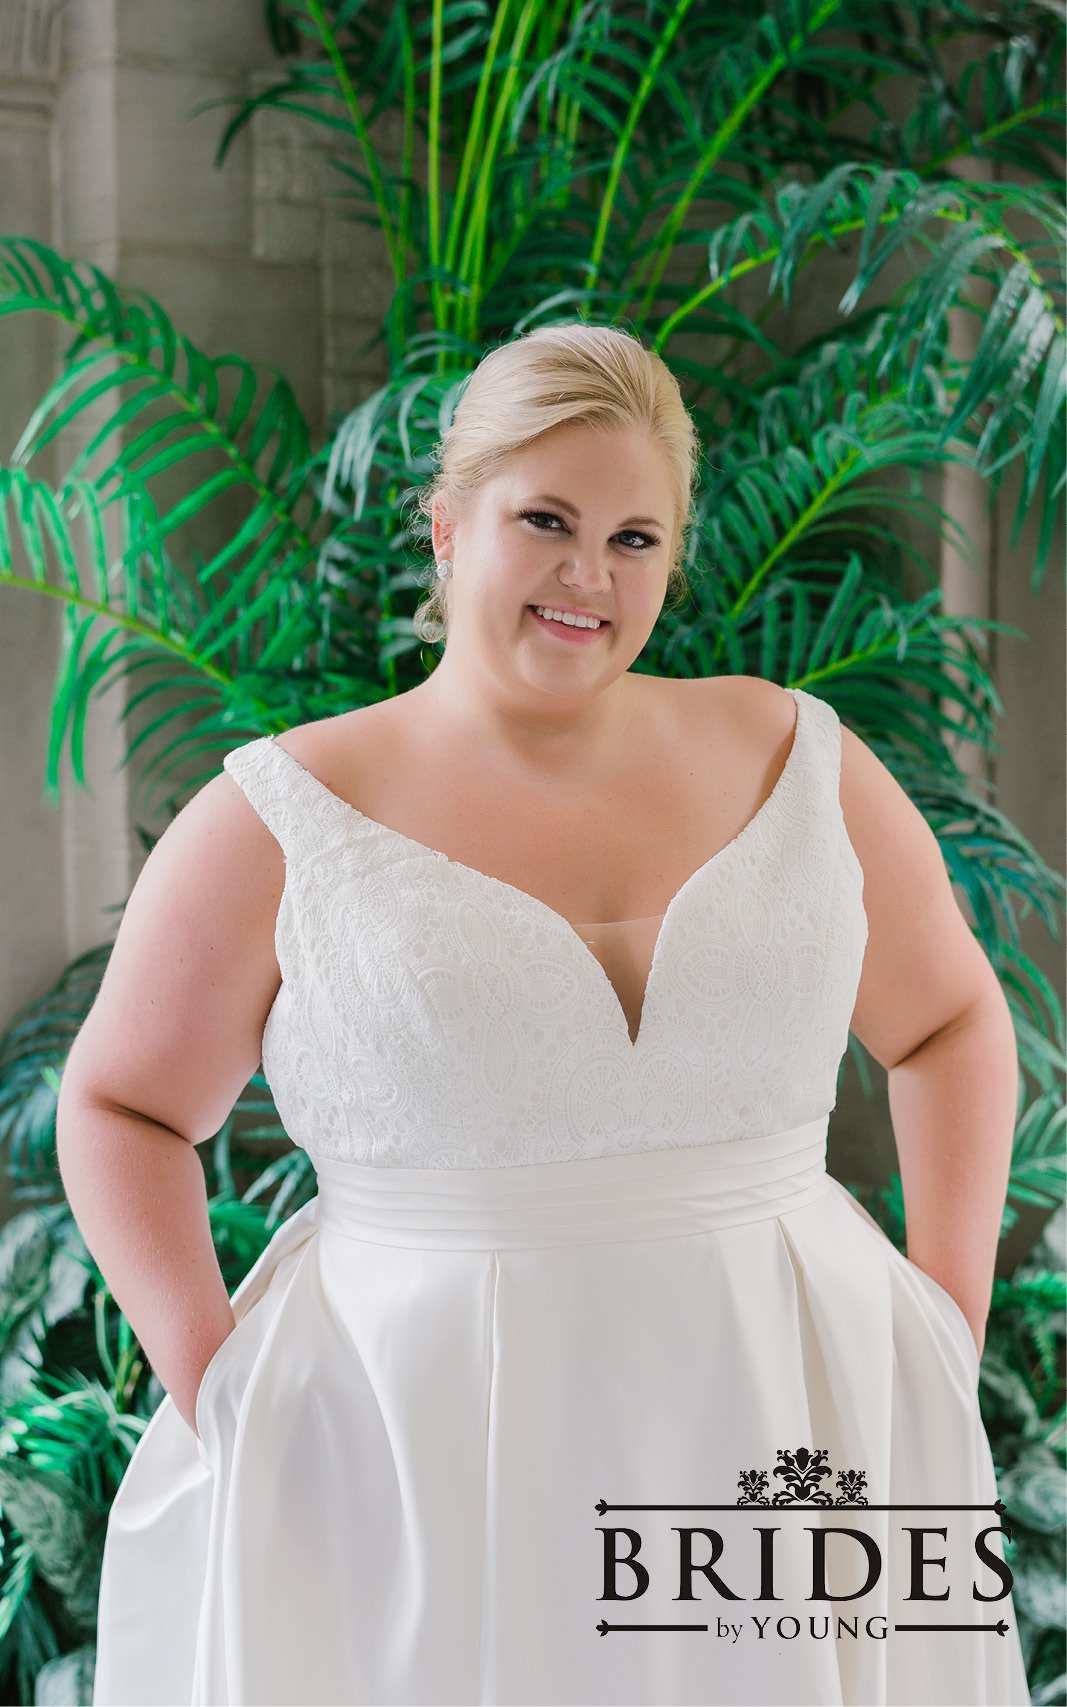 BridesbyYoung-2020Collection-PlusSizeBridalBoutique-CurvyWeddingDressInspiration-169.jpg